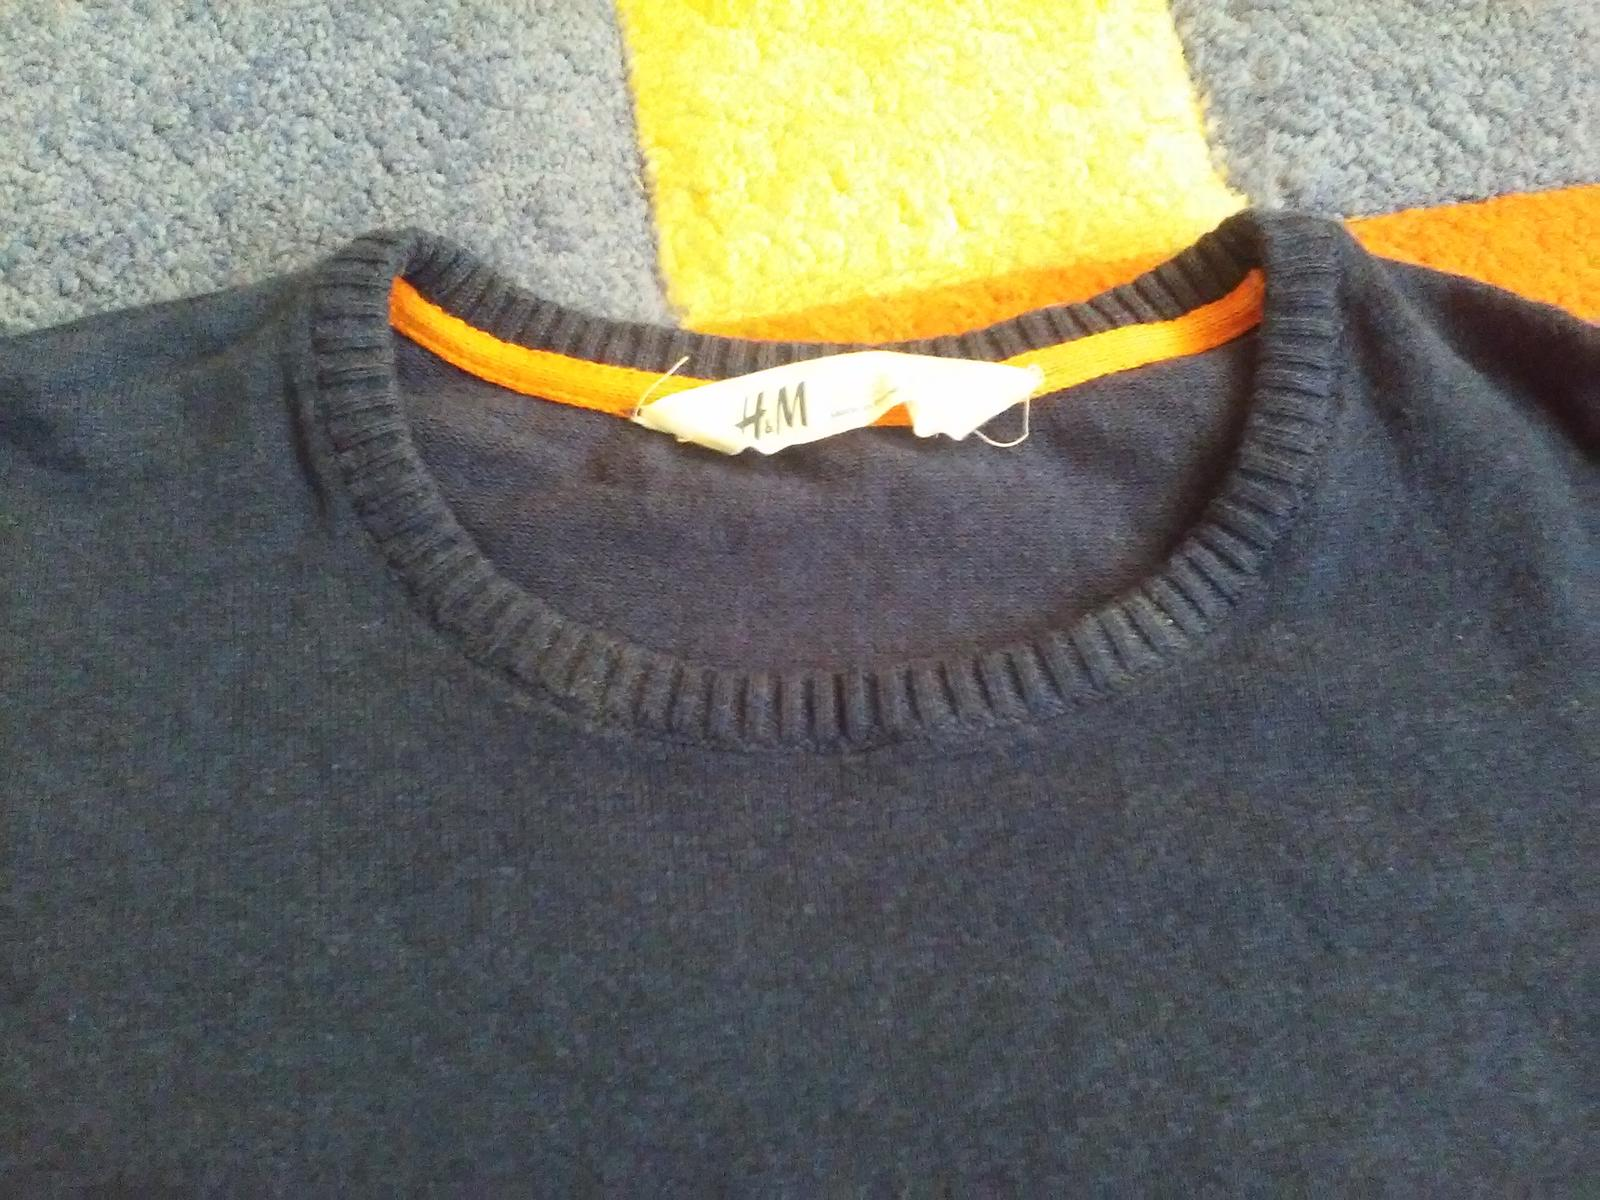 Tmavomodrý svetrík H&M - Obrázok č. 3